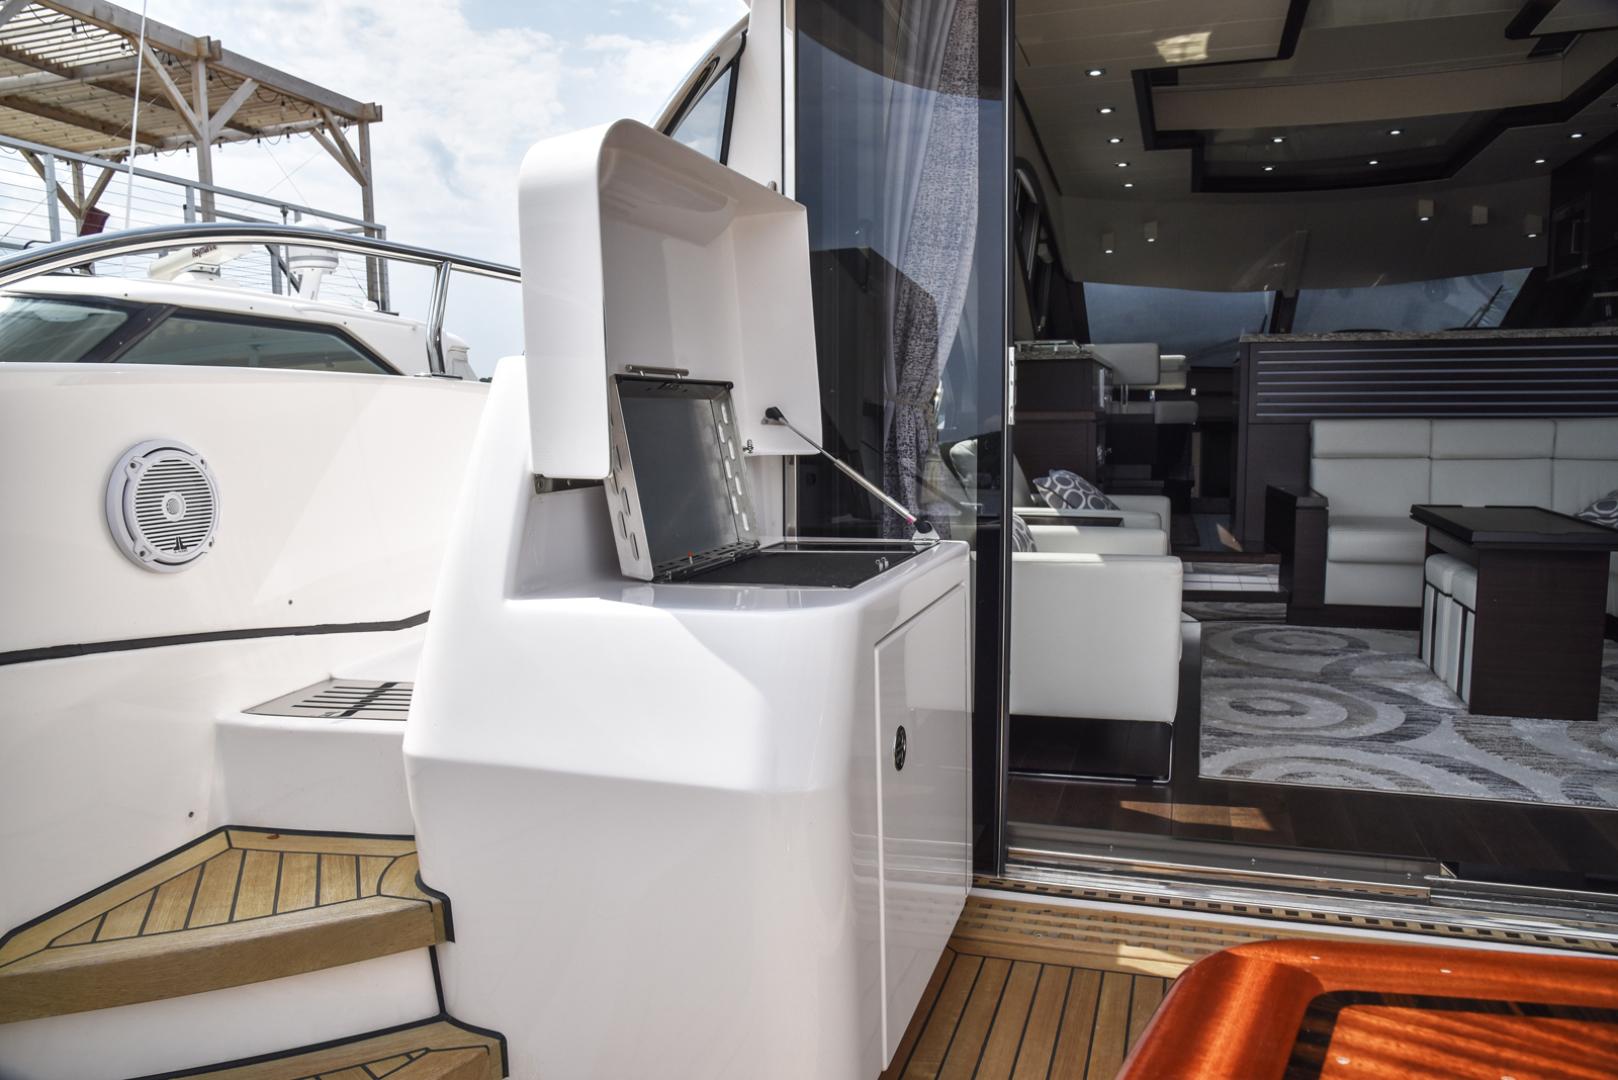 Neptunus-Motor Yacht Express 2018-LIQUID WISDOM Grand Haven-Michigan-United States-Side deck access-1485010 | Thumbnail